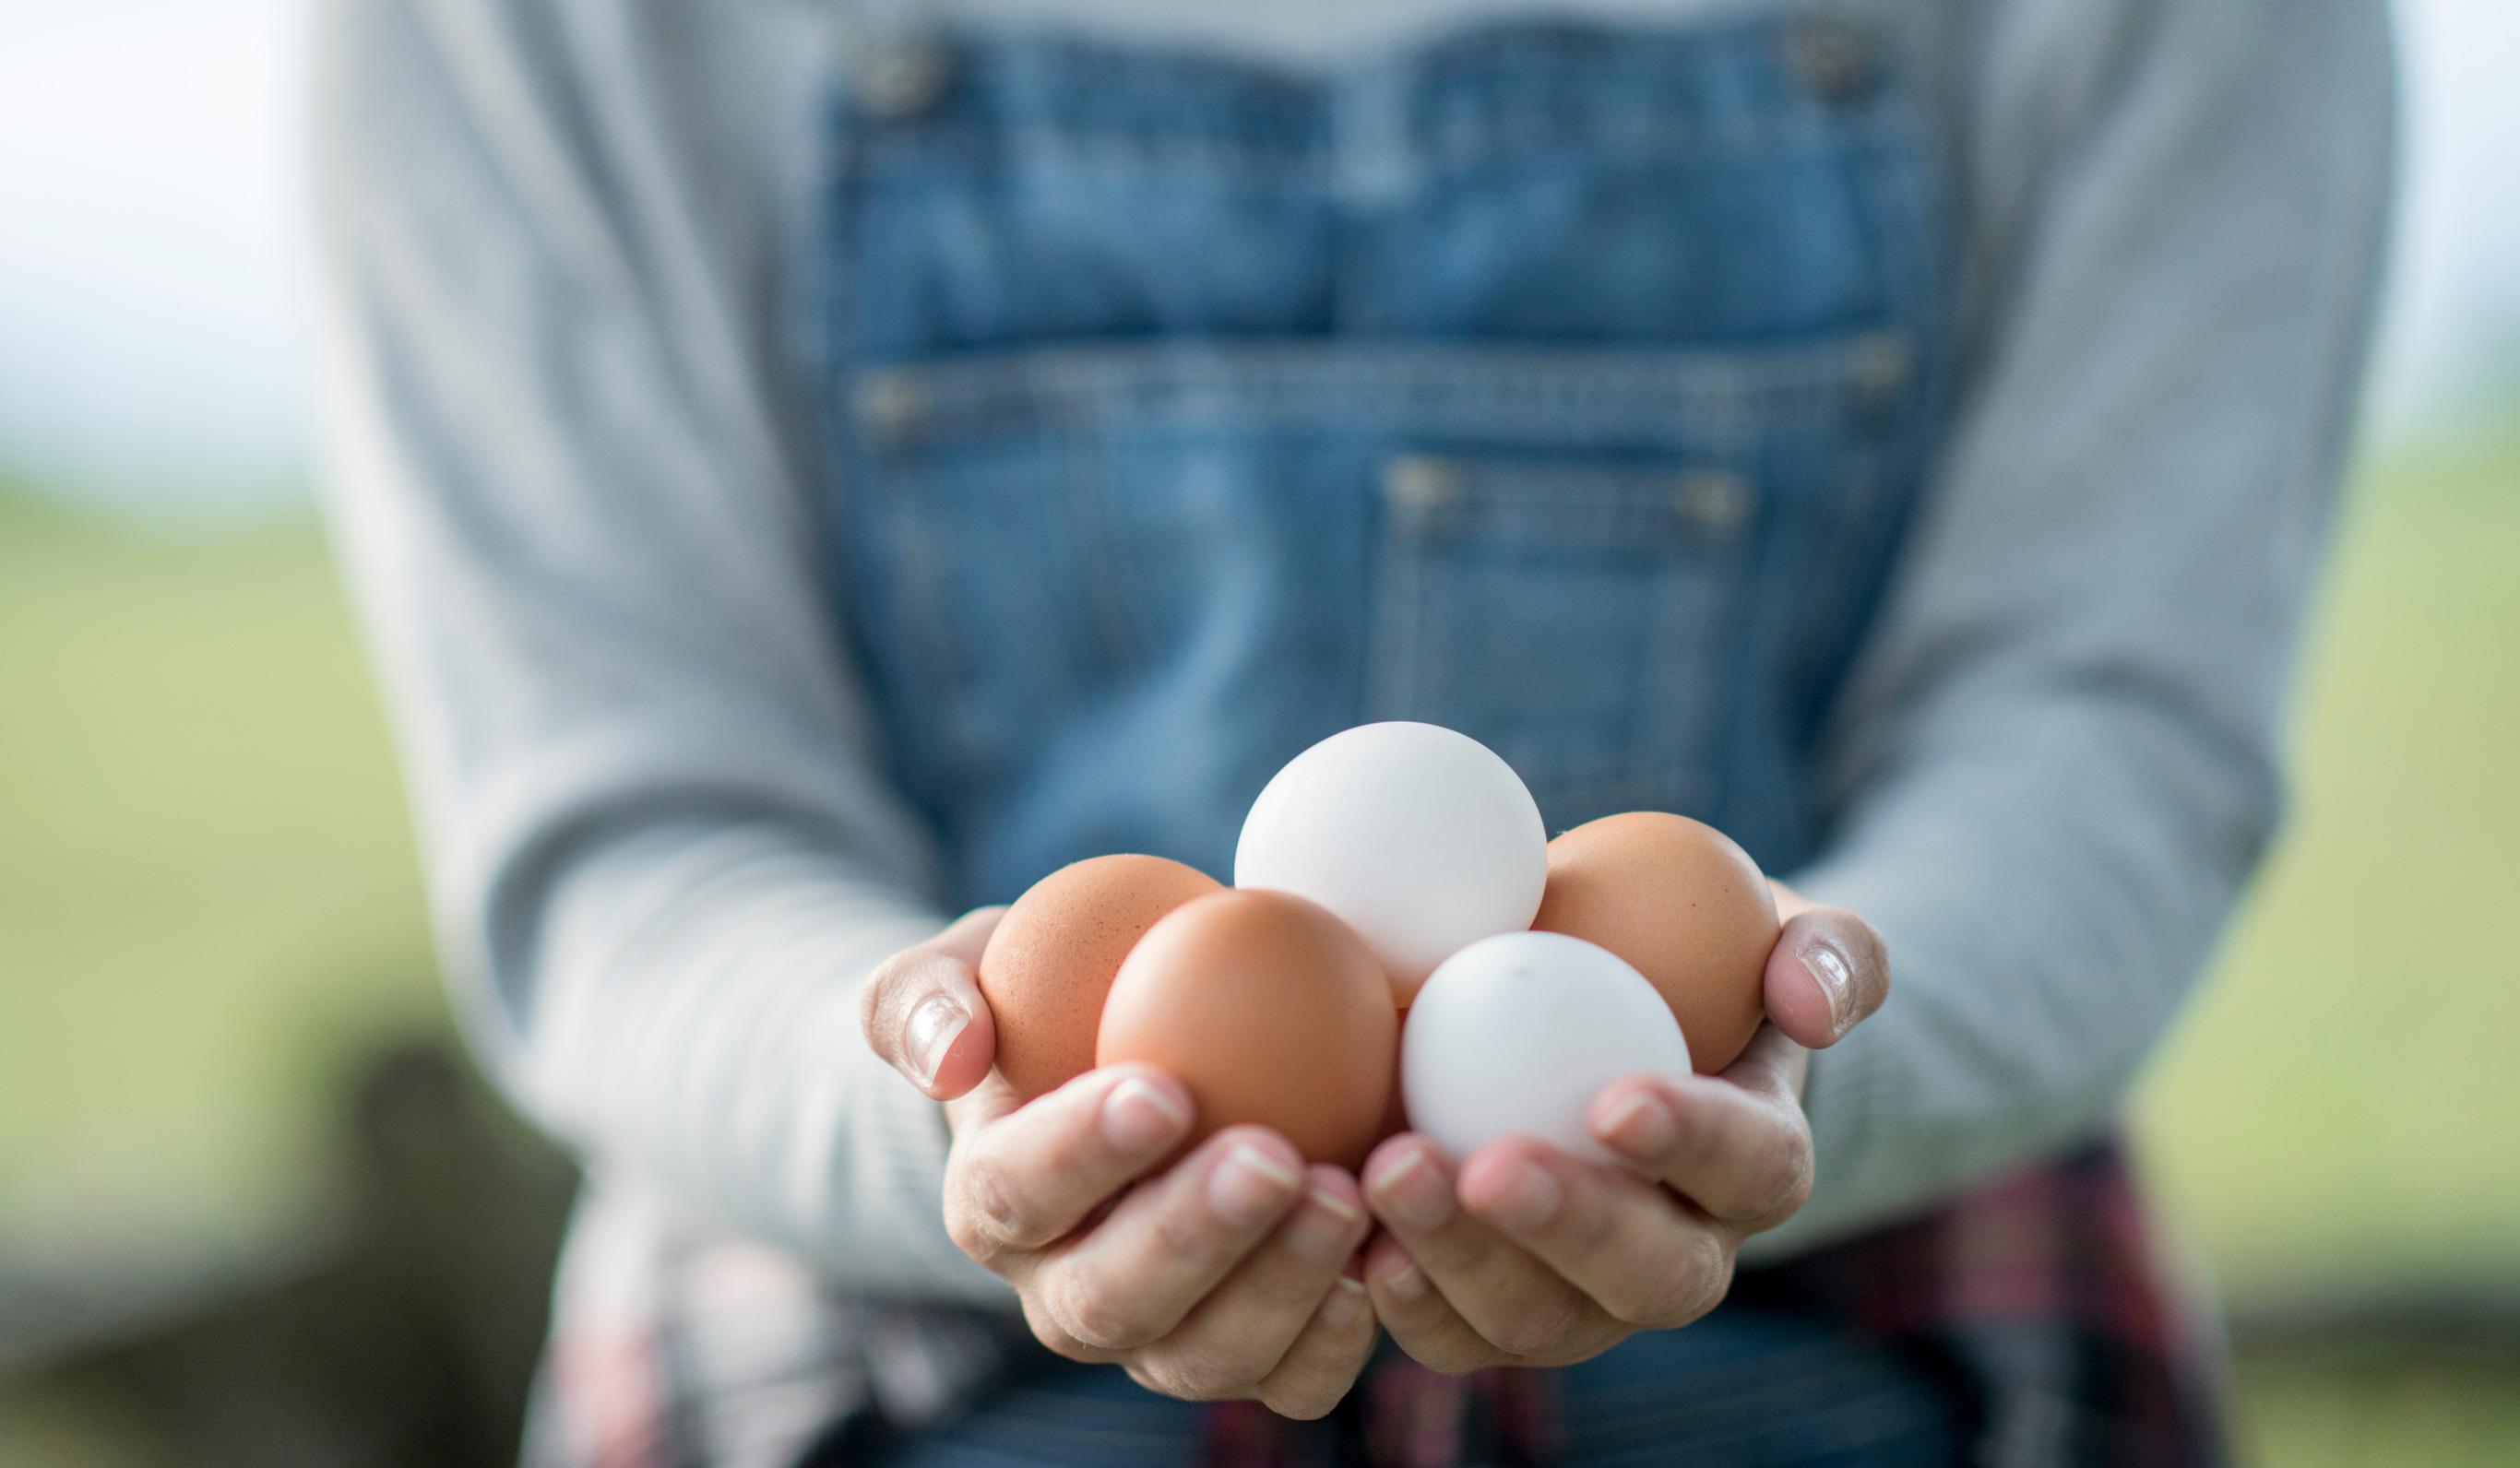 Image for H εταιρεία μας χρησιμοποιεί αποκλειστικά cage-free αυγά